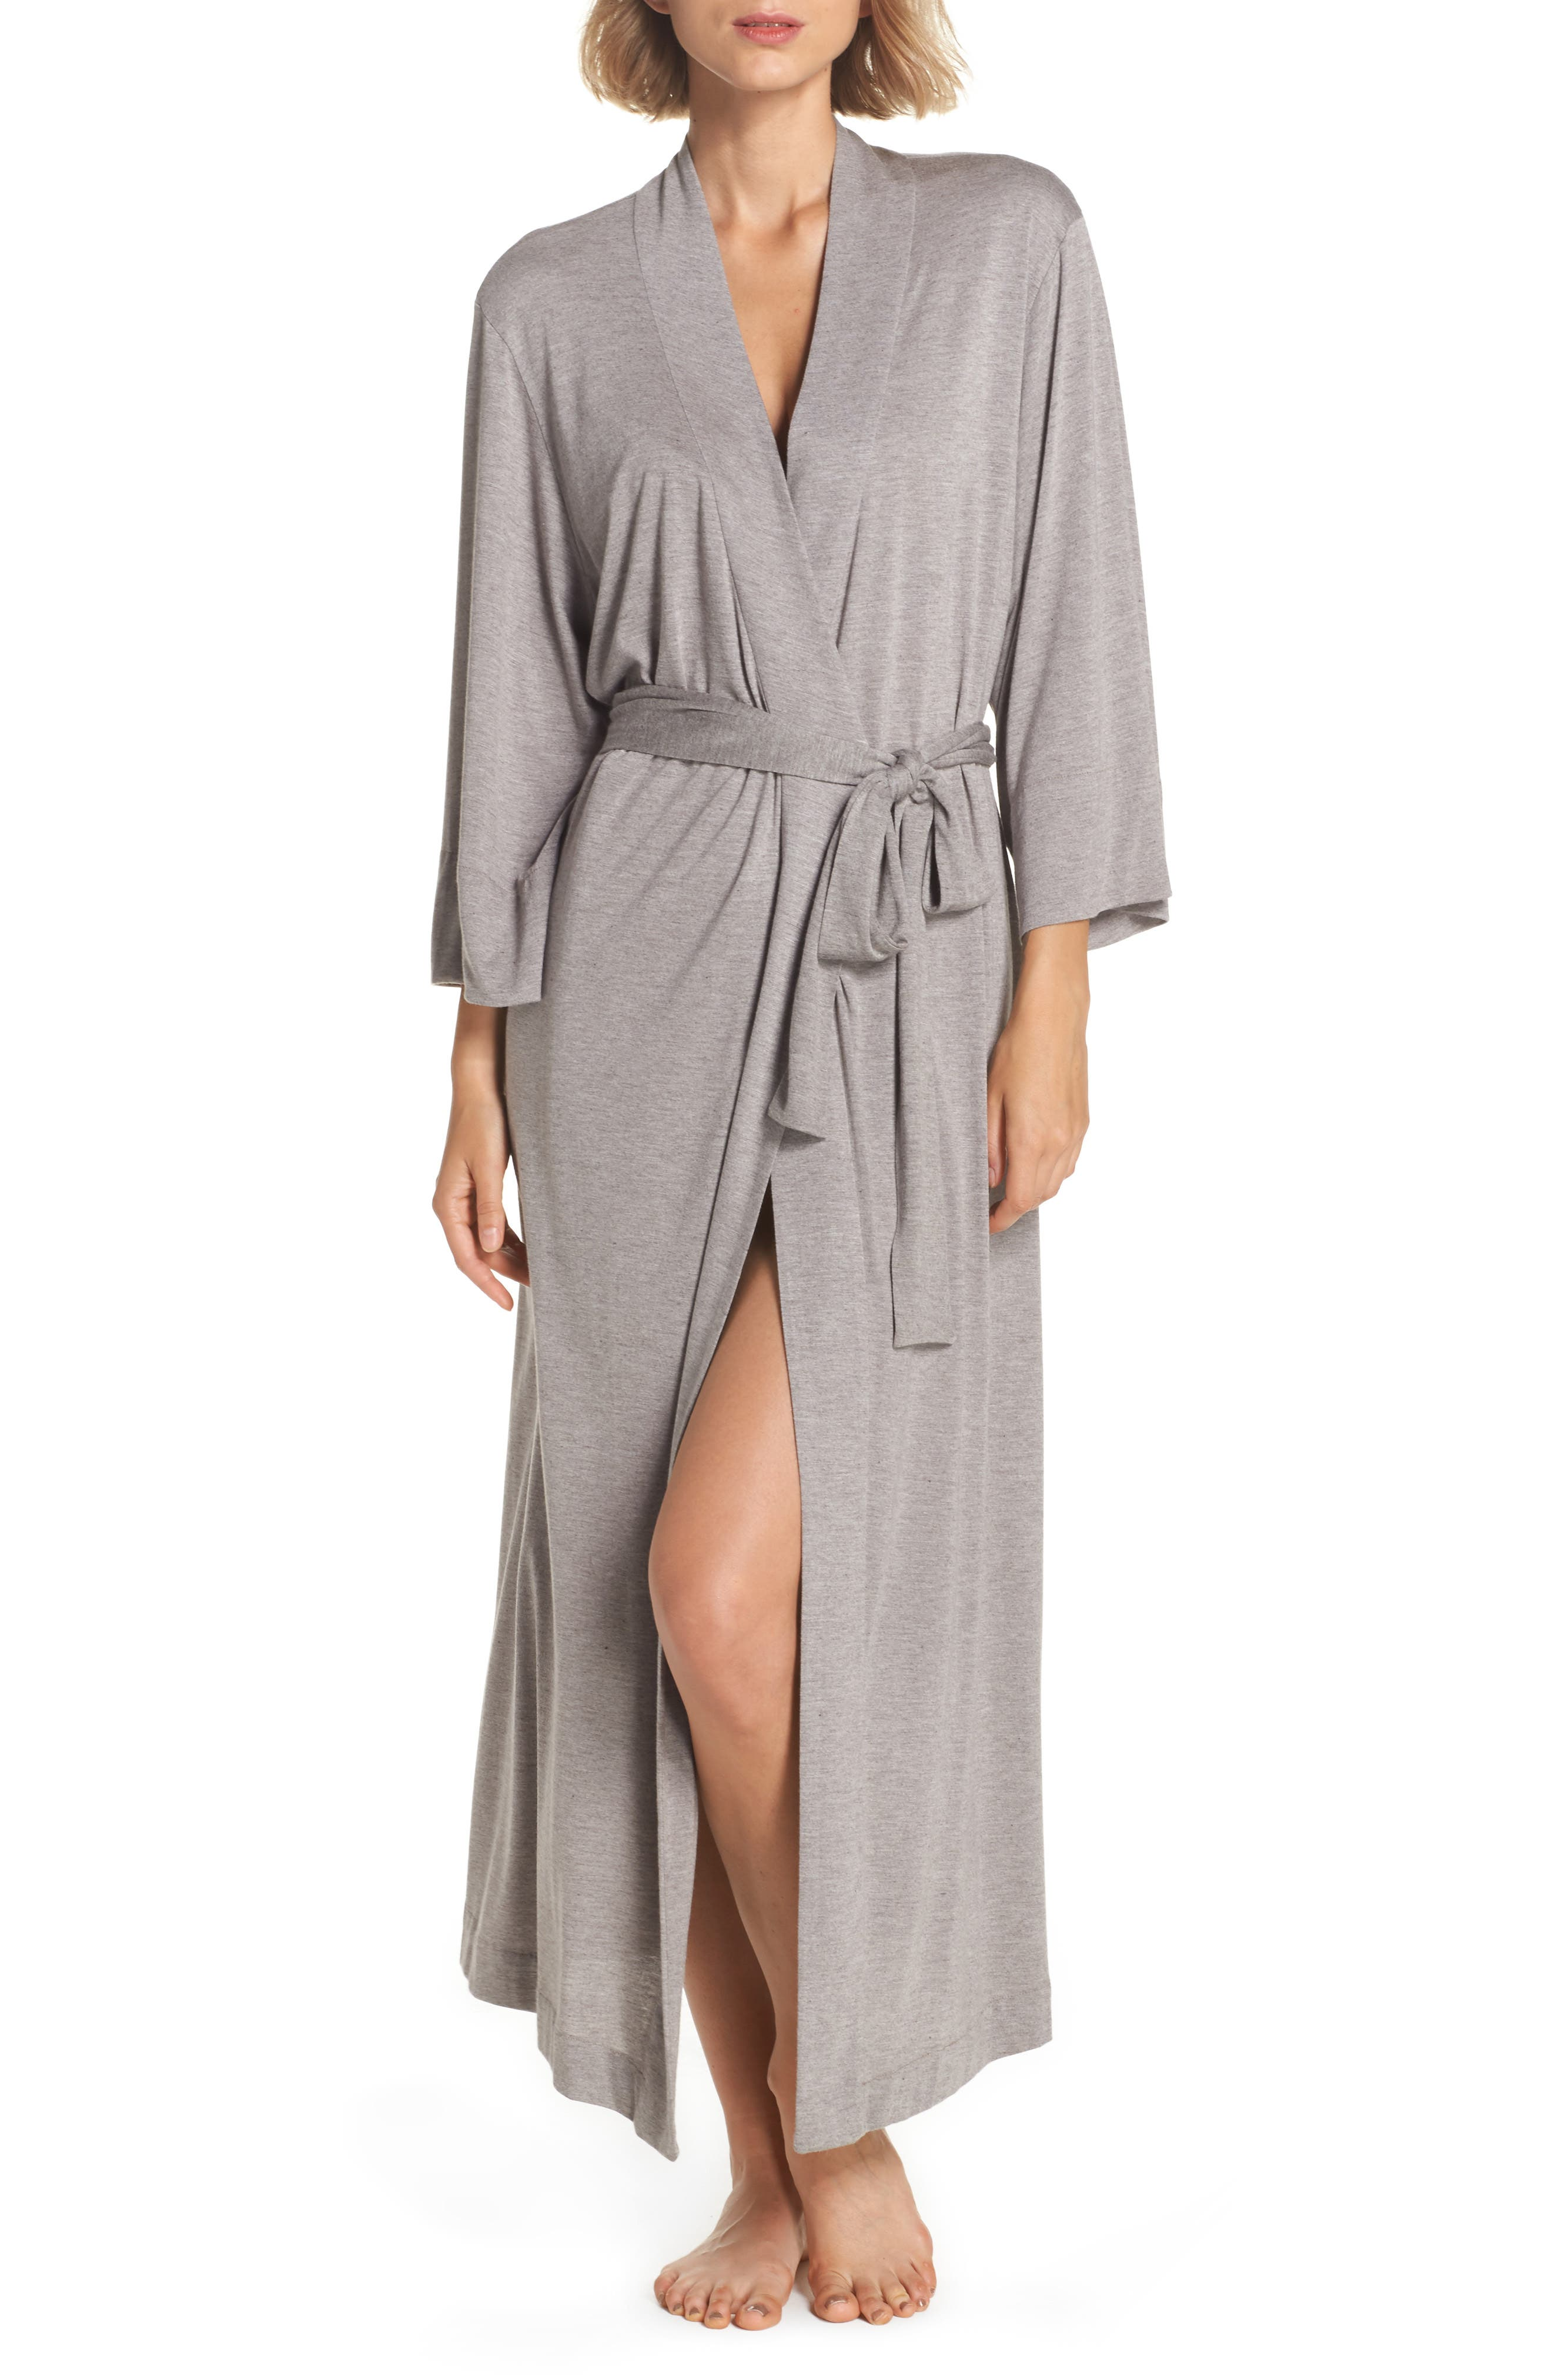 'Shangri-La' Robe,                         Main,                         color, 250